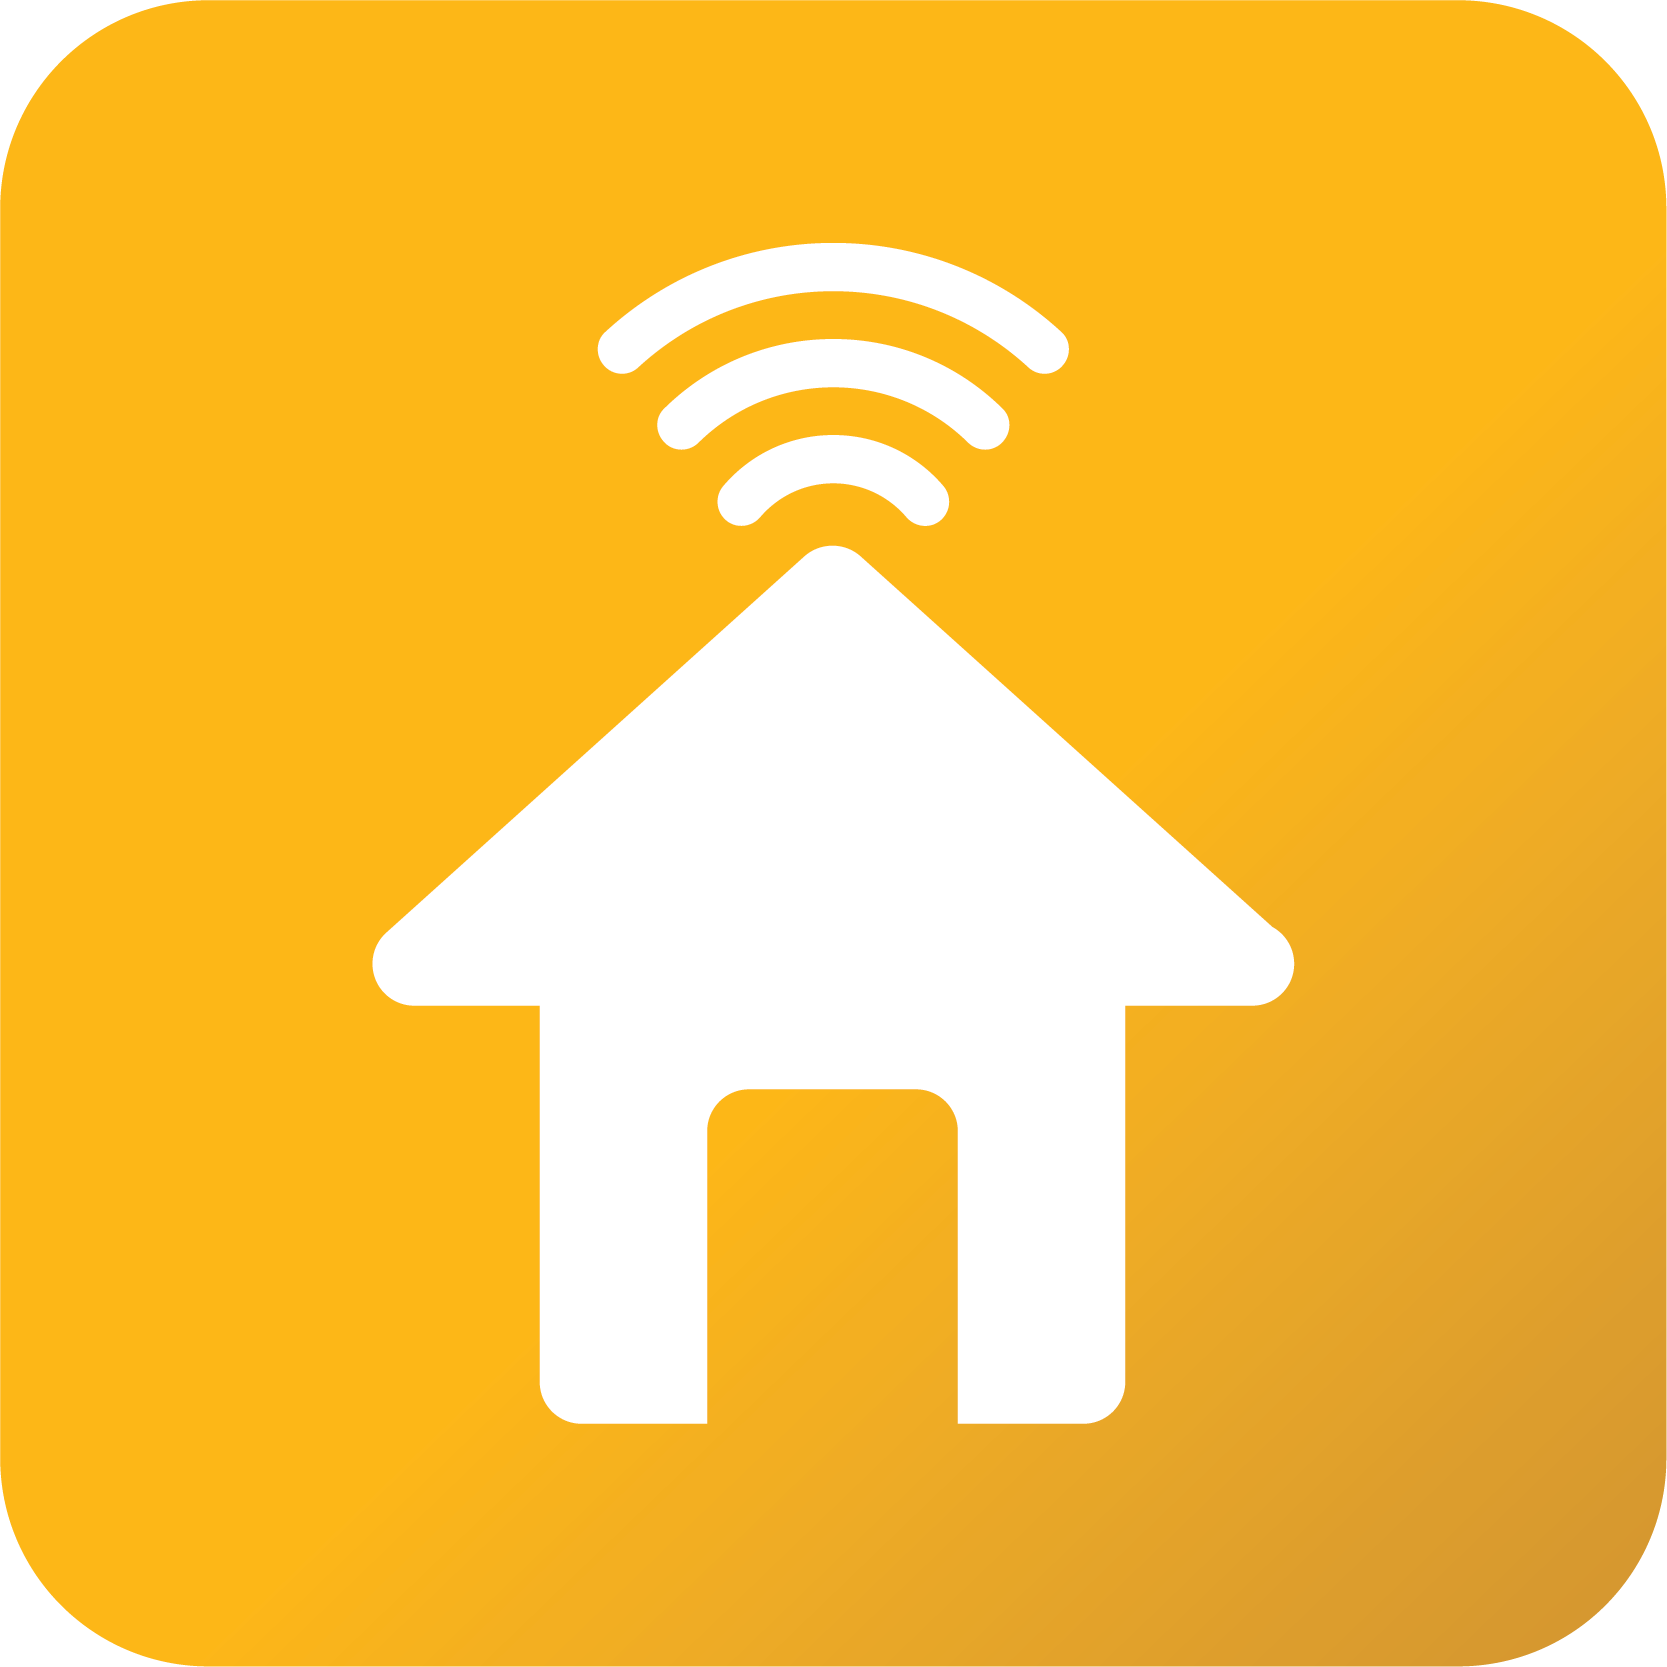 Broadband internet service - Residential